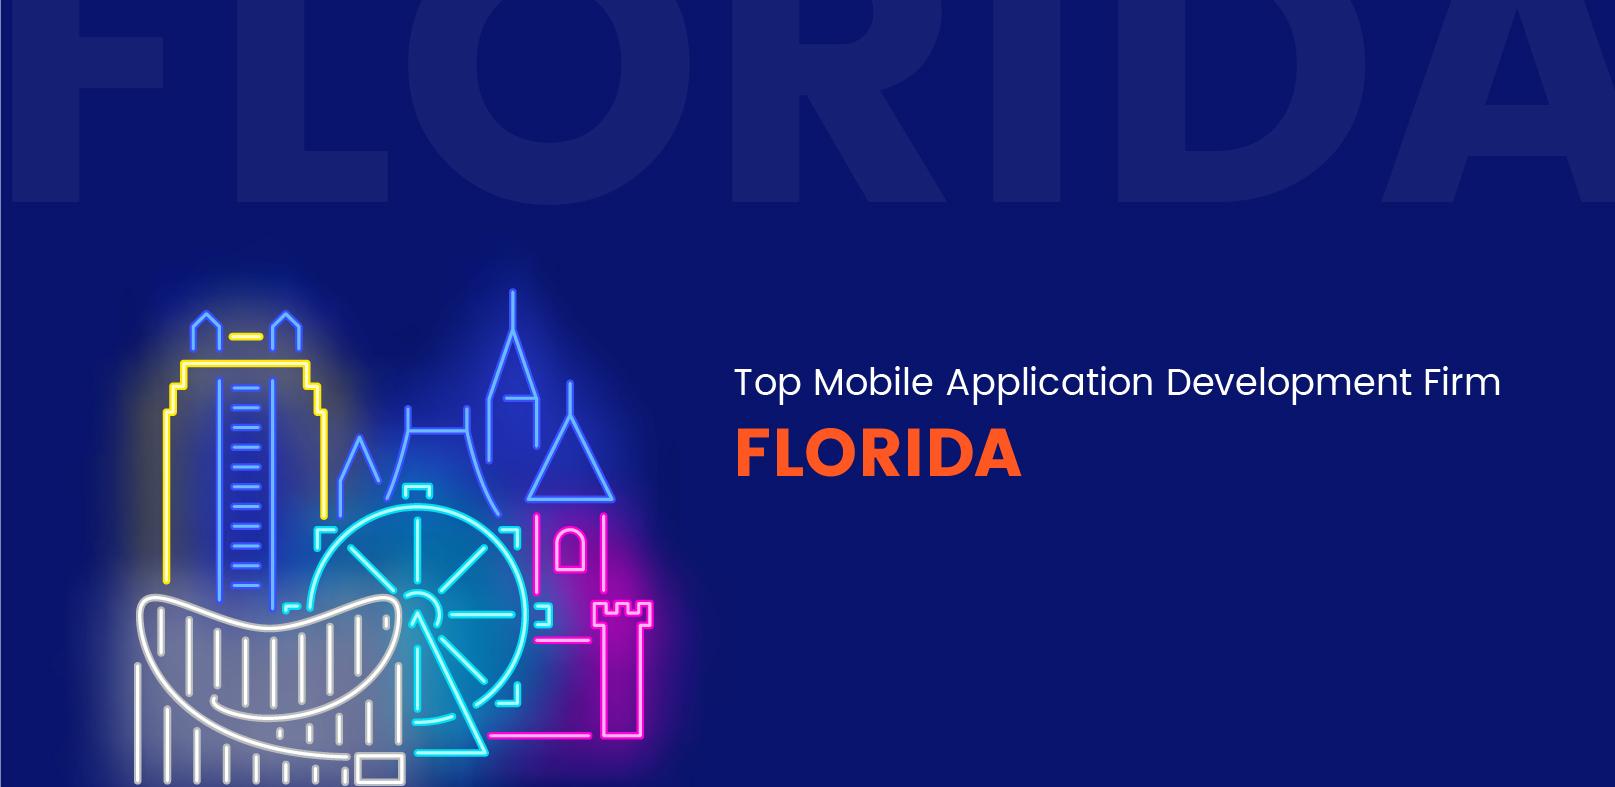 TOP MOBILE APPLICATION DEVELOPMENT FIRM IN FLORIDA - WebClues Infotech